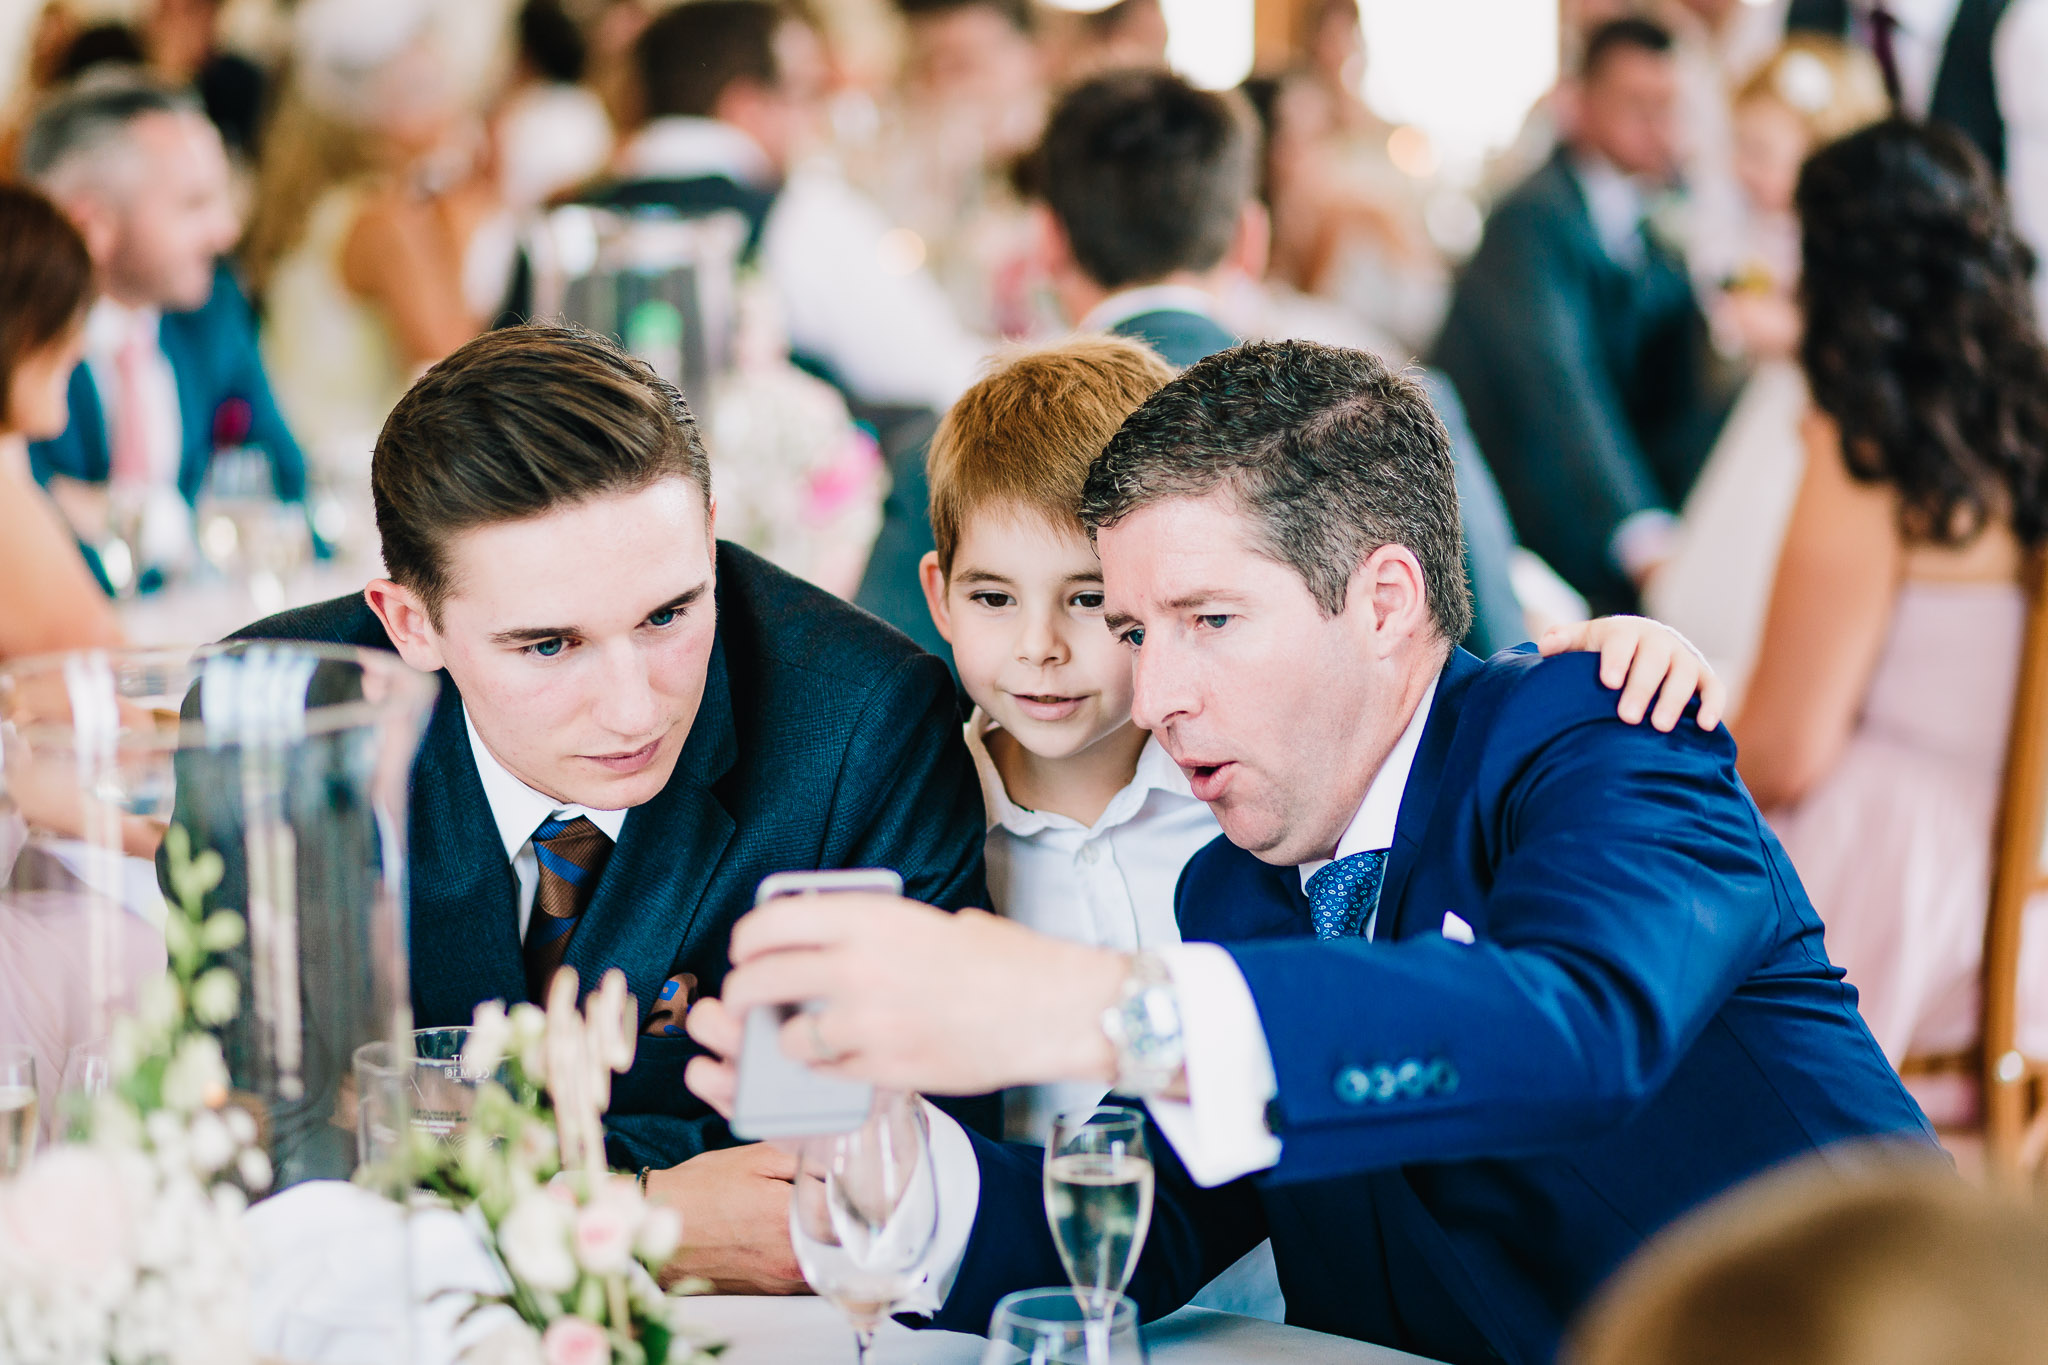 WEDDING GUESTS CANDID PORTRAITS